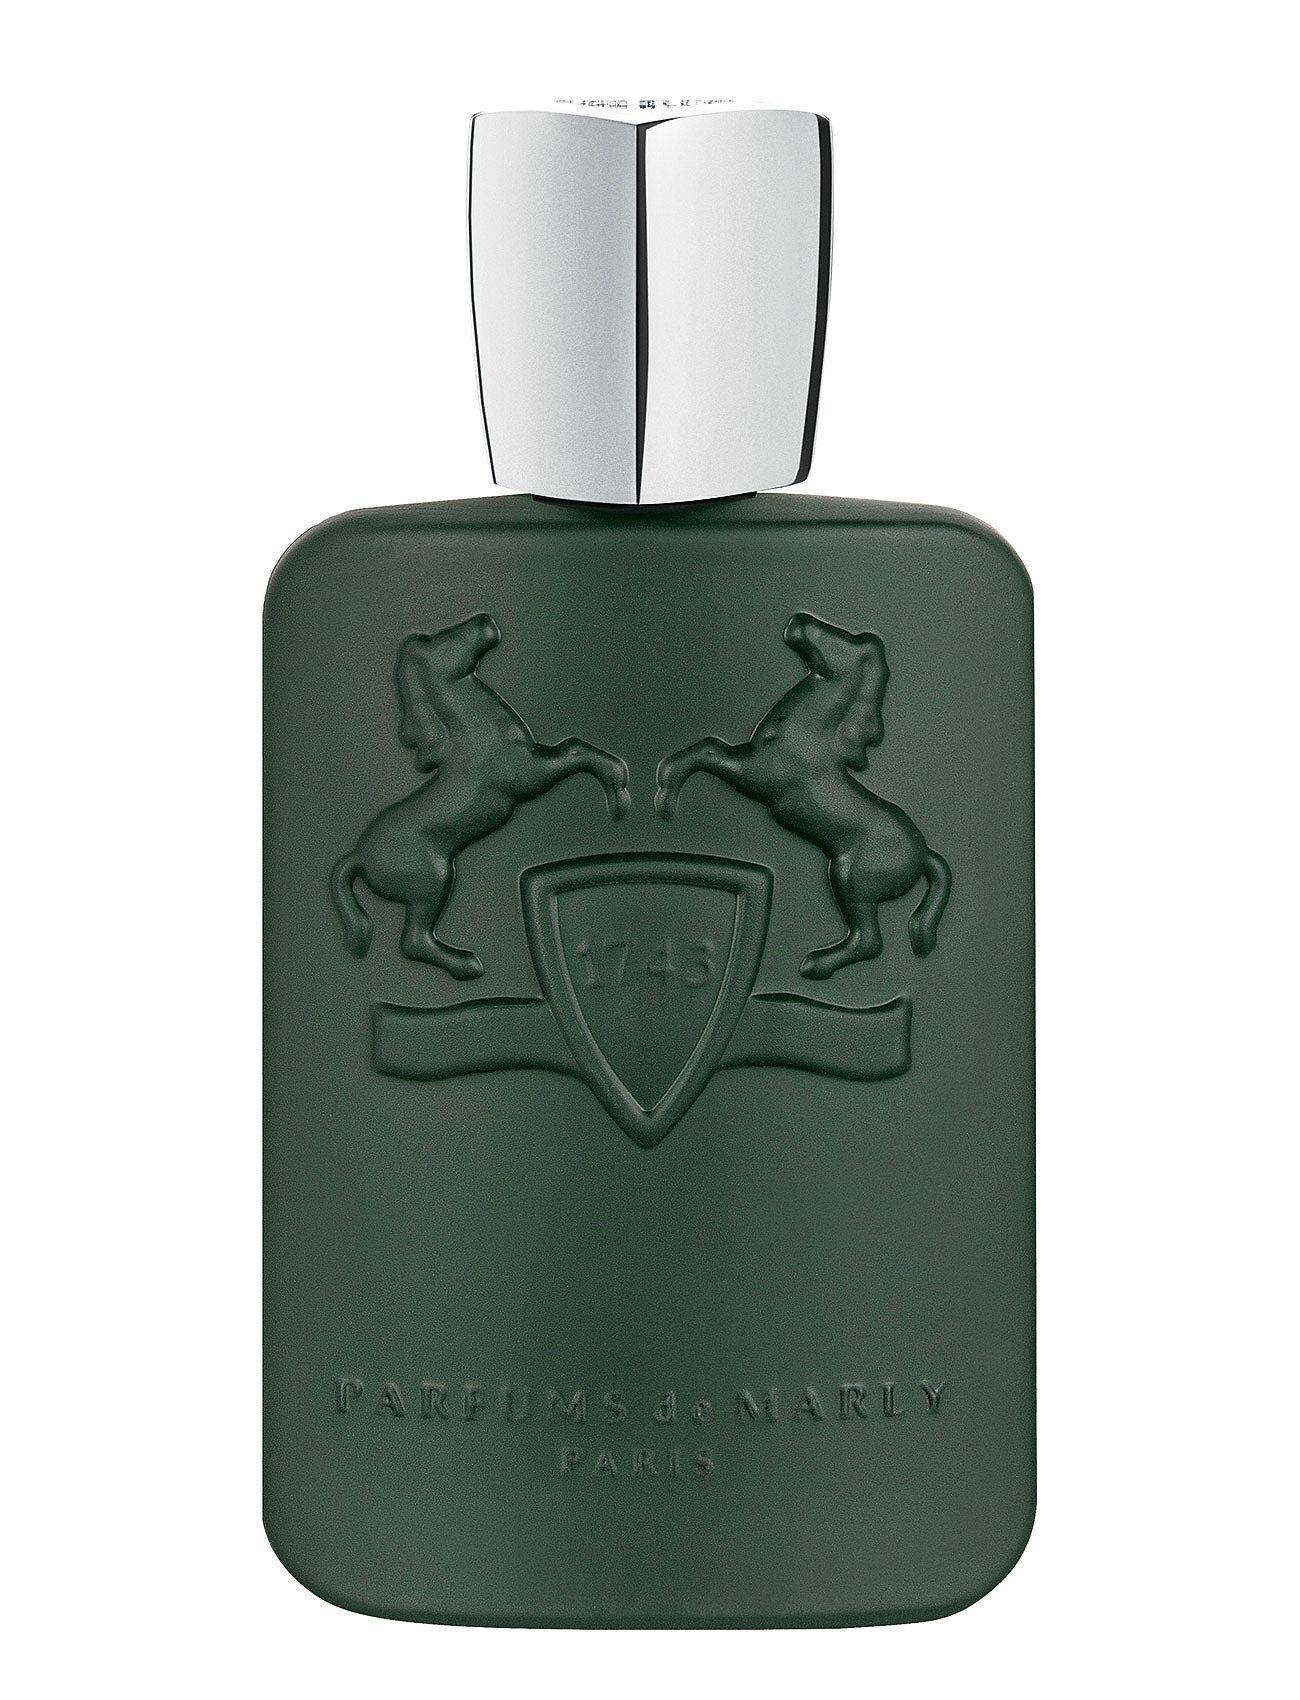 Parfums de Marly Byerley Edp 125 Ml